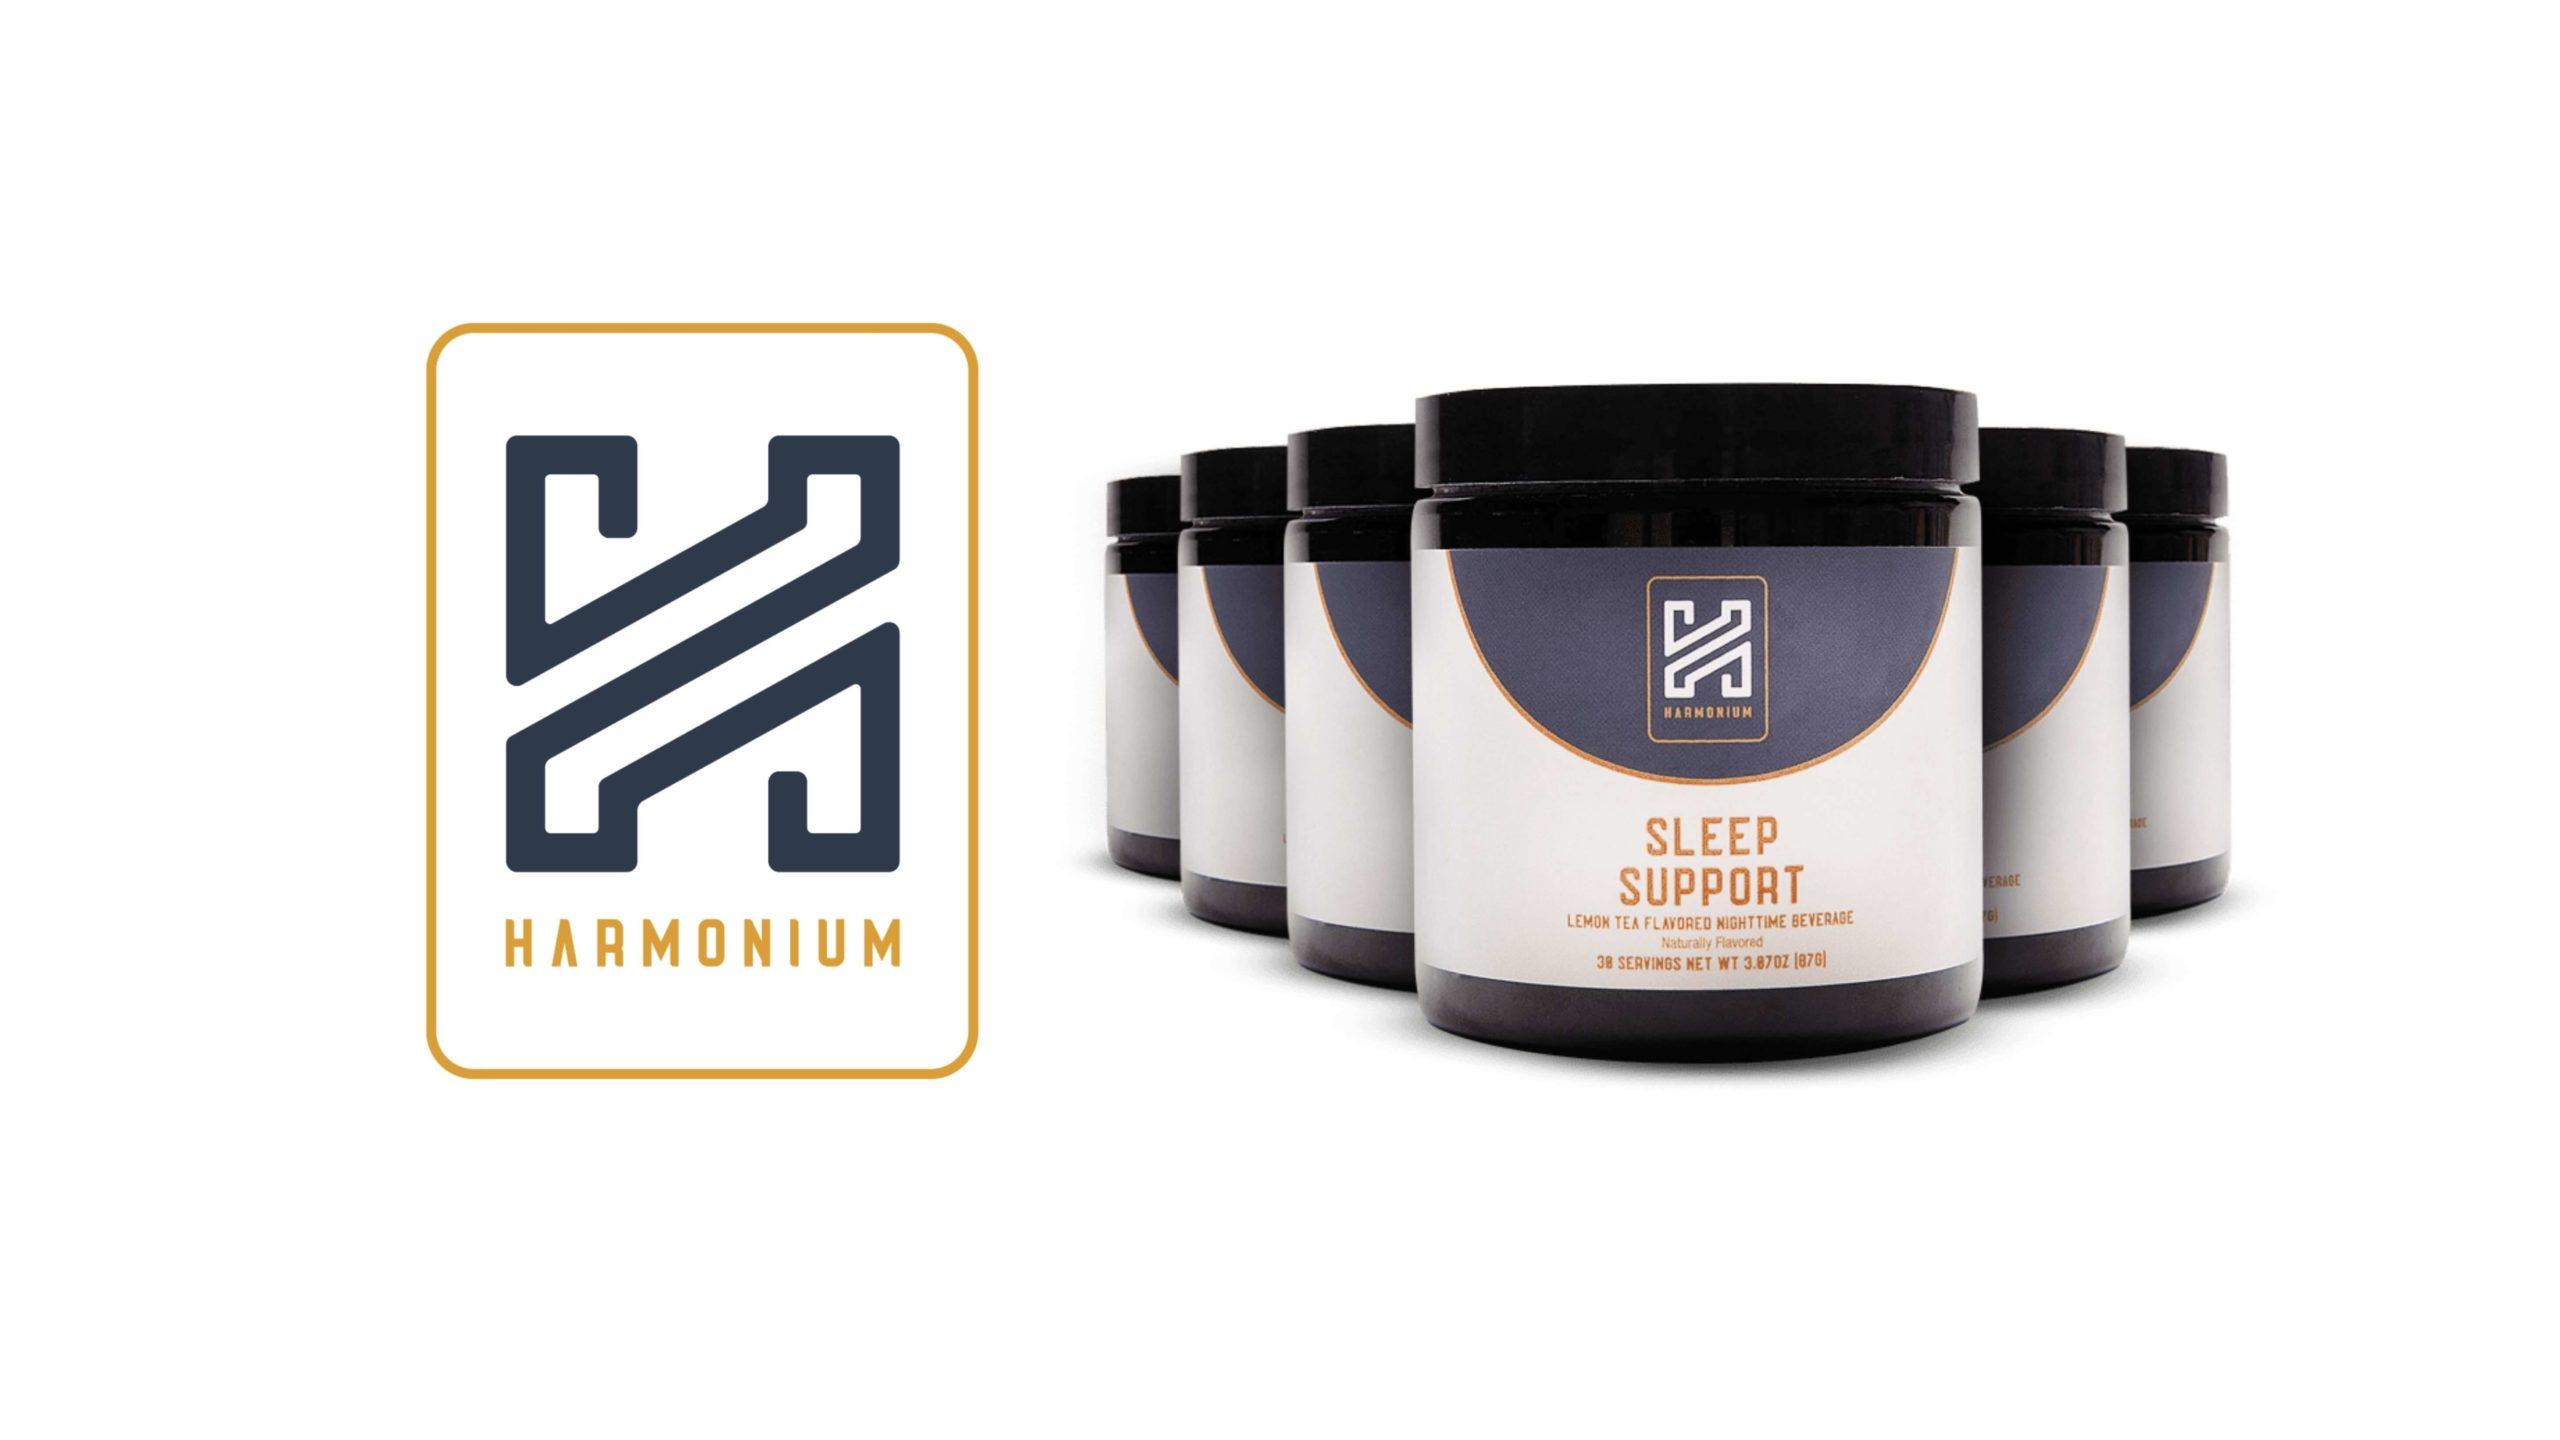 Harmonium Sleep Support Manufacturer